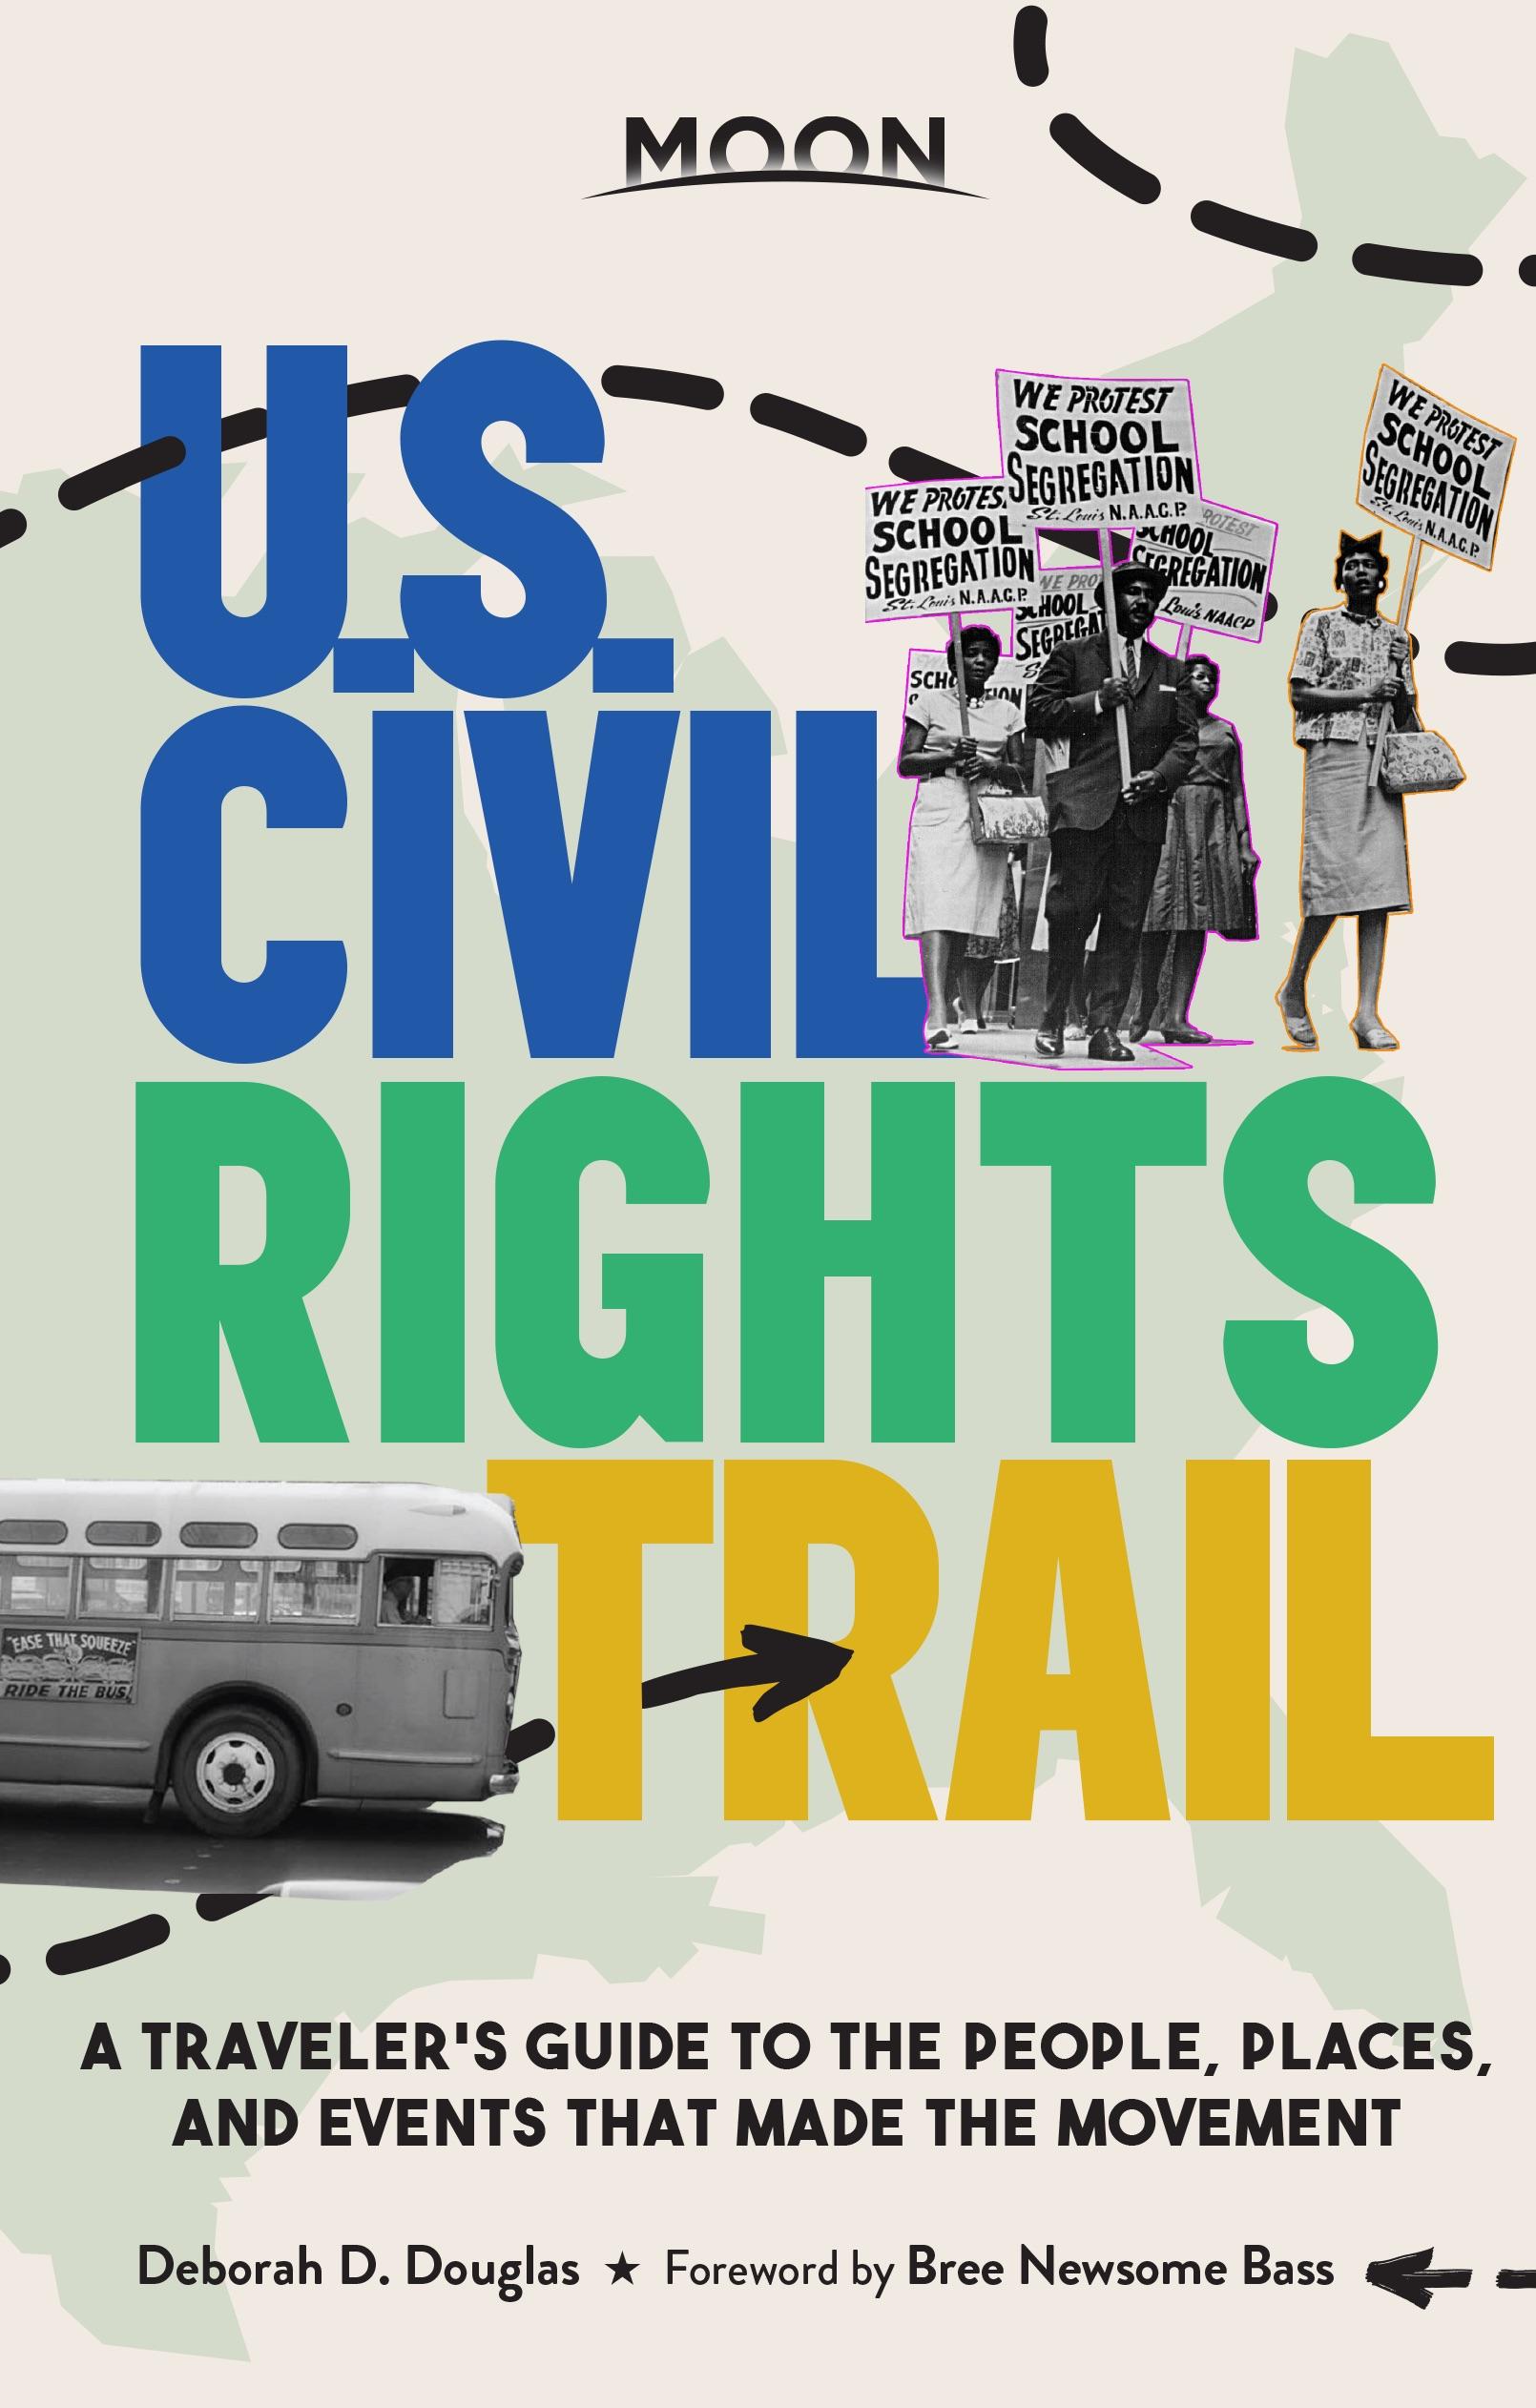 "Cover of ""Moon U.S. Civil Rights Trail"" by Deborah D. Douglas."